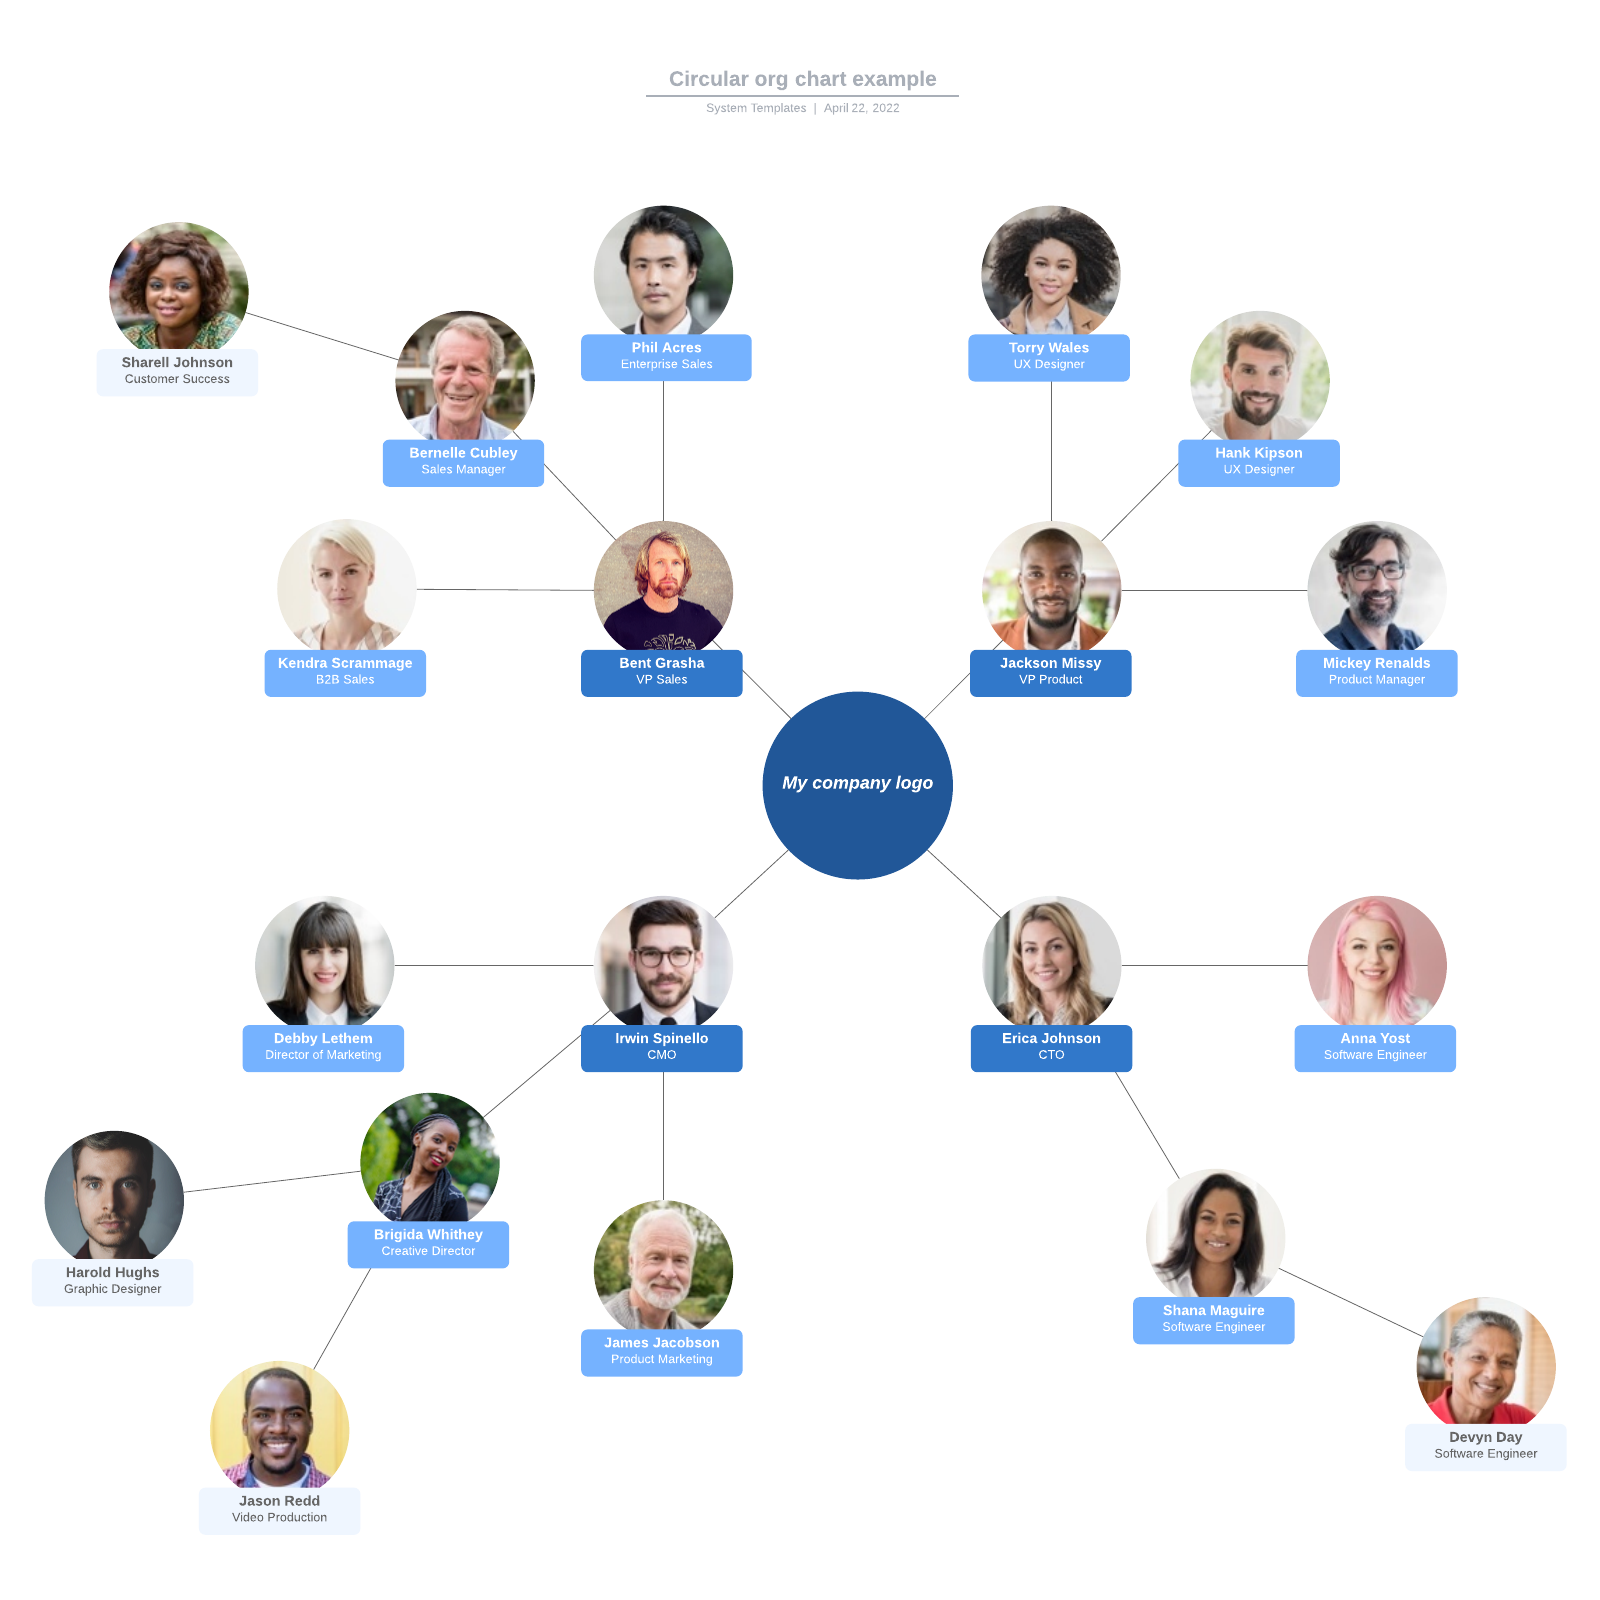 Circular org chart example